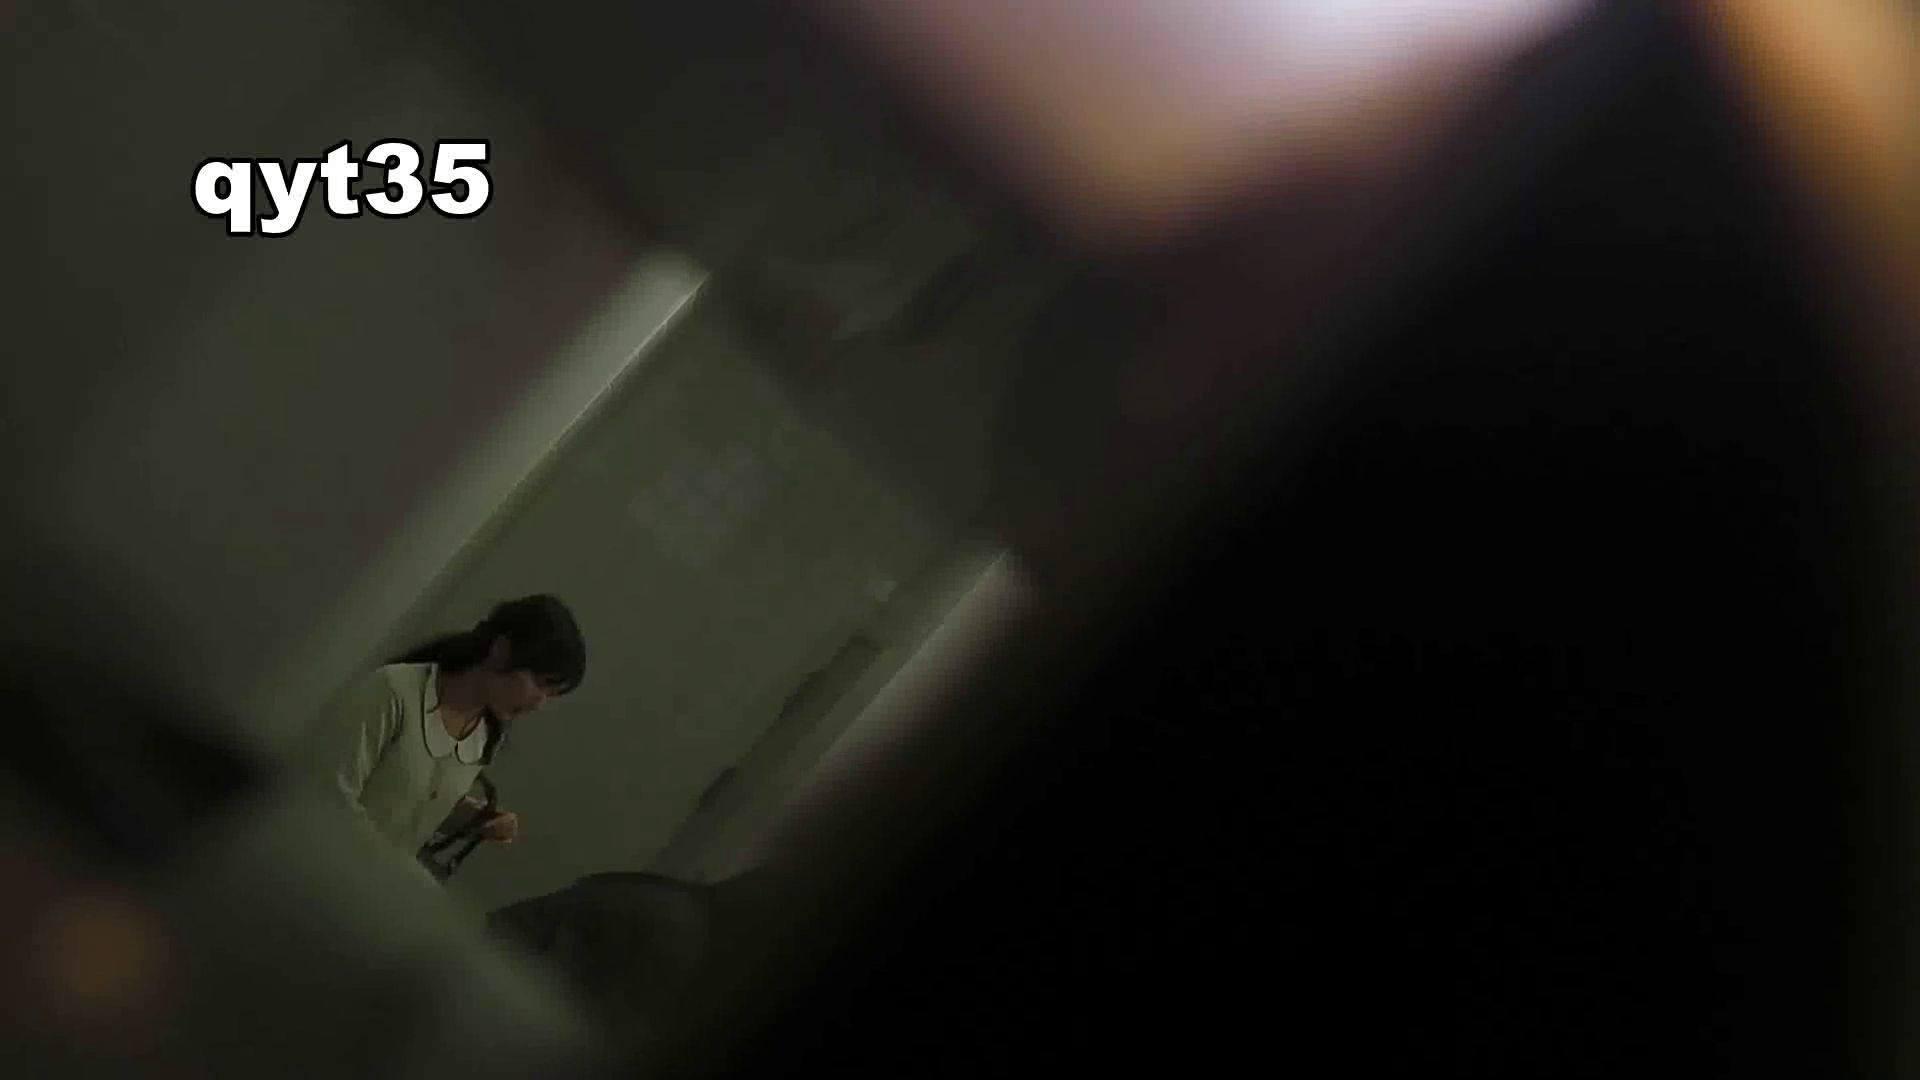 vol.34 命がけ潜伏洗面所! 広げると出ます 洗面所 盗撮エロ画像 74pic 59